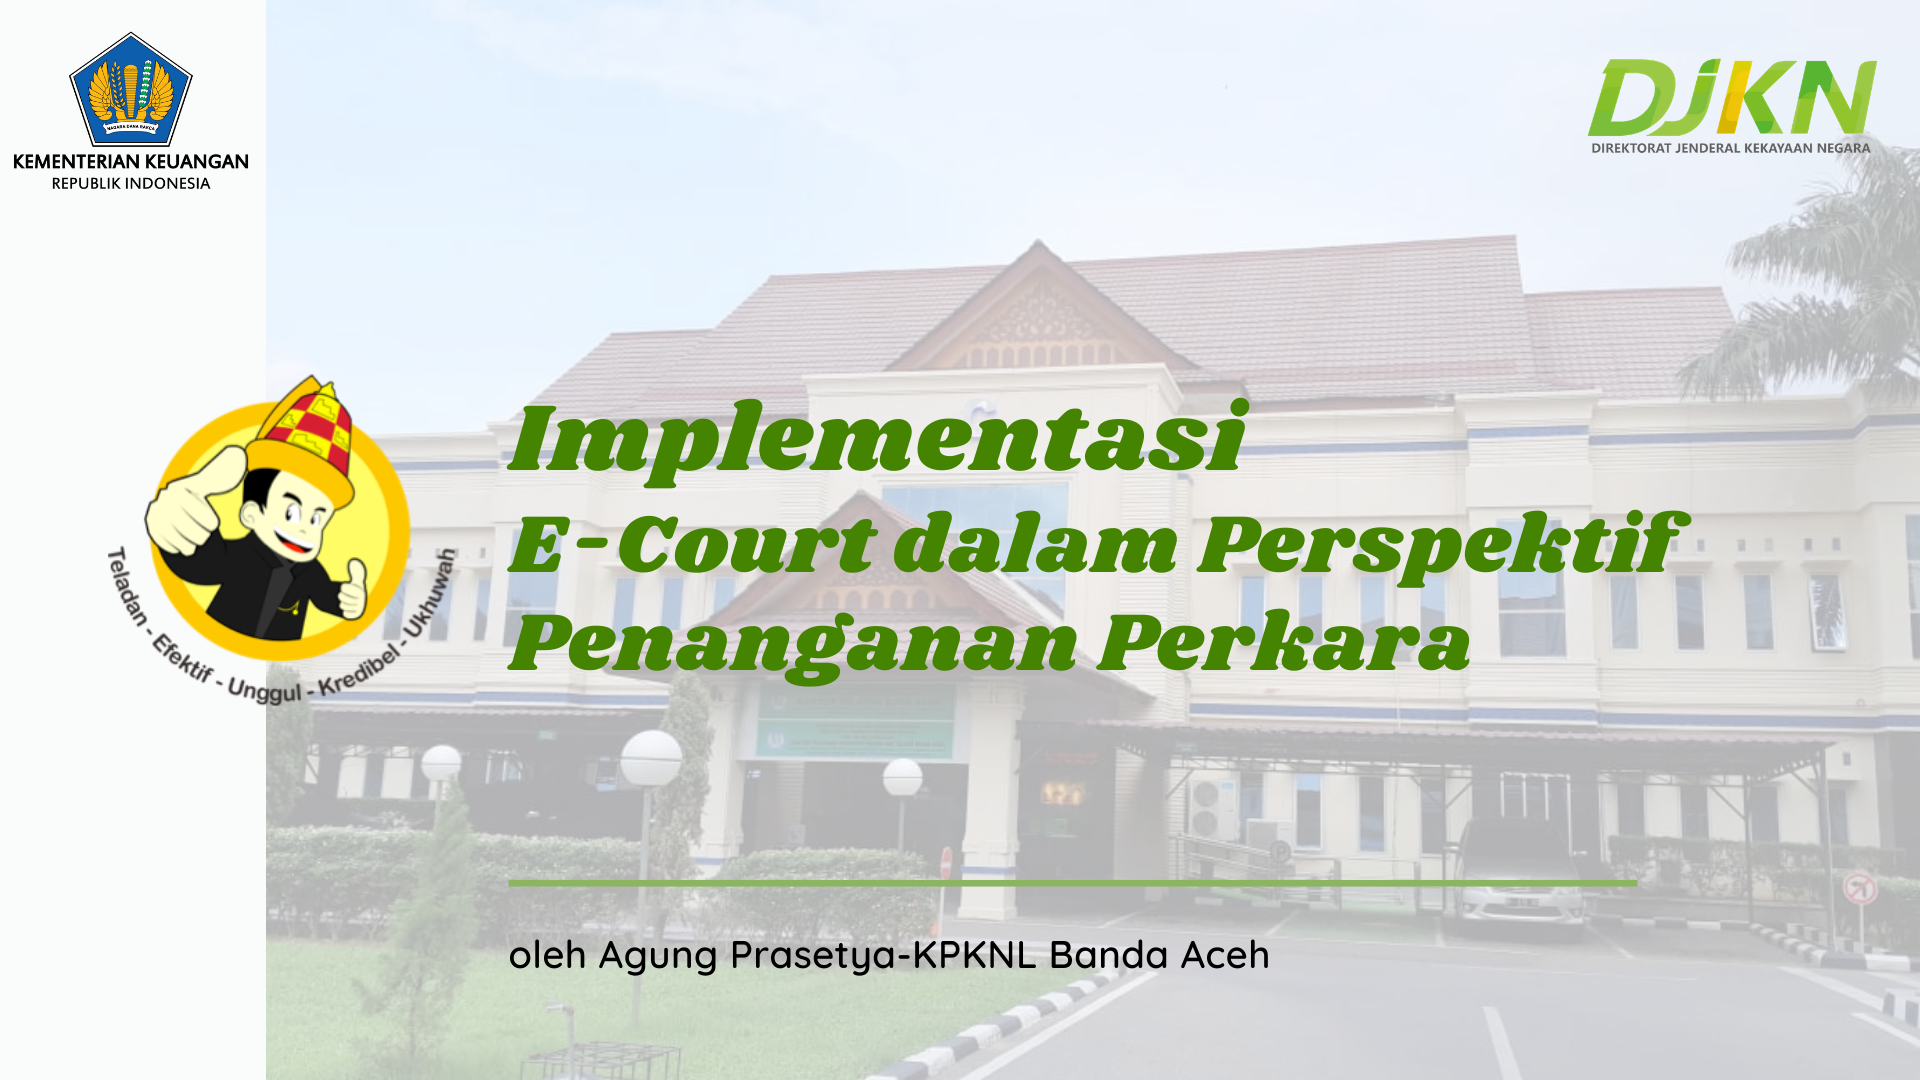 Implementasi E-Court dalam Perspektif Penanganan Perkara